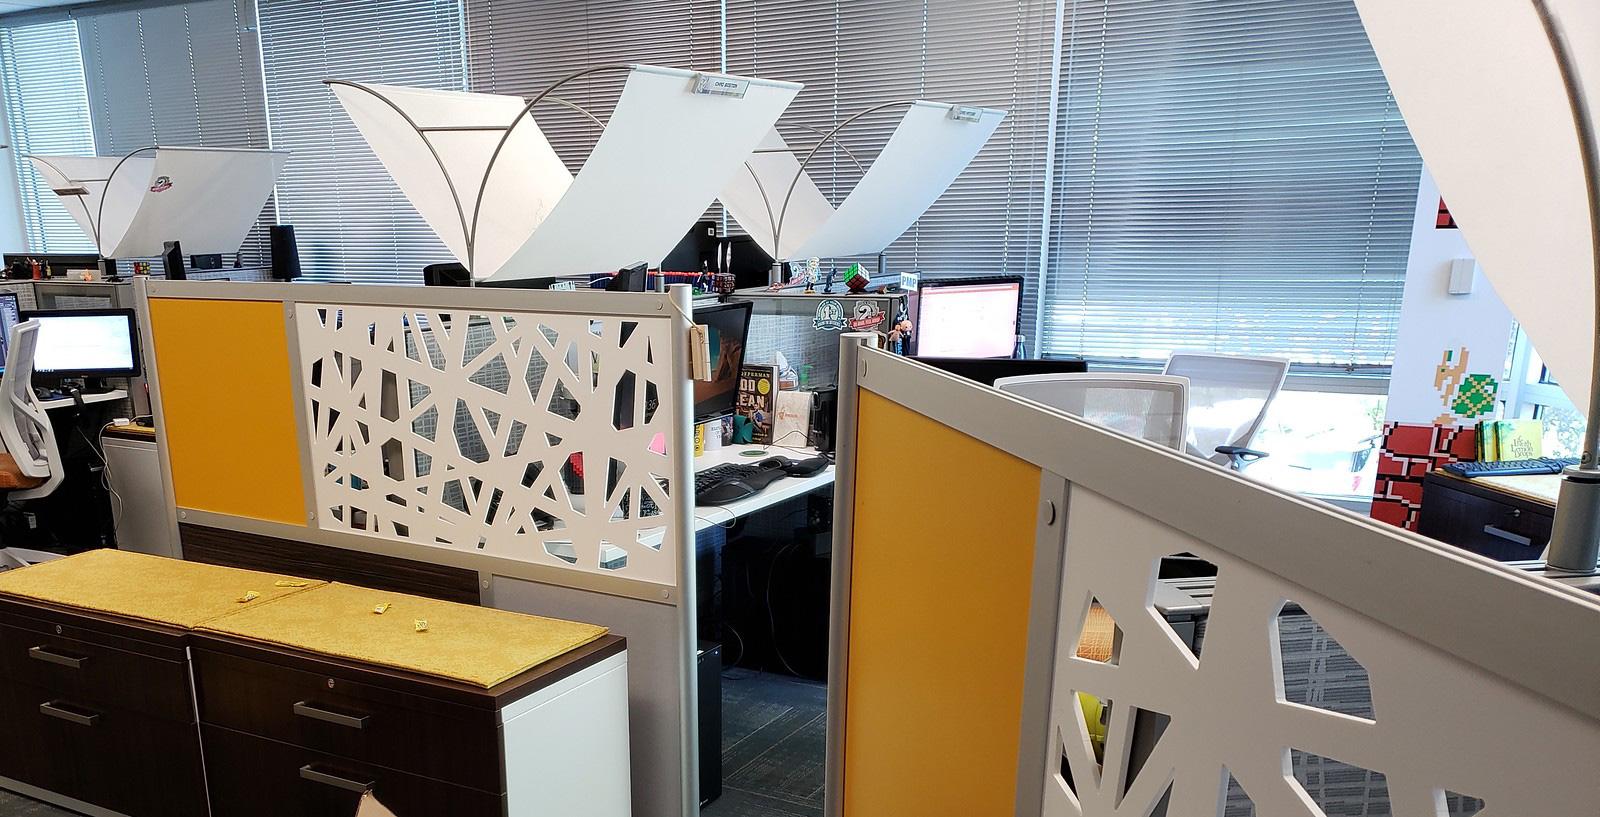 furniture-cubicles-in-tampa-florida-3-.jpg